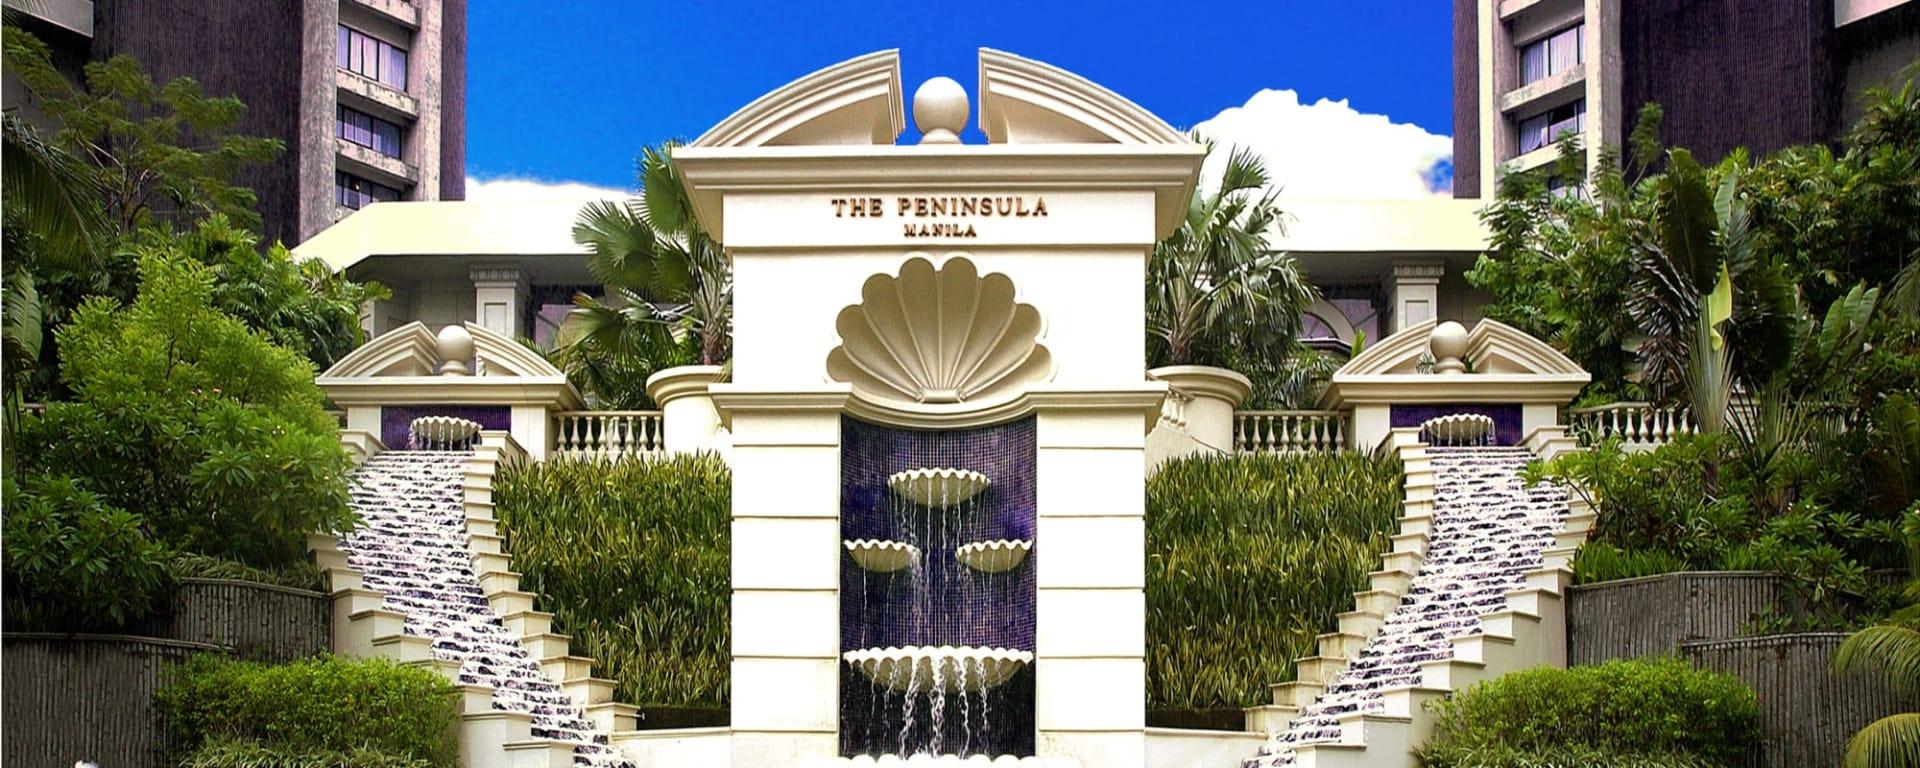 The Peninsula in Manila: The Peninsula Manila